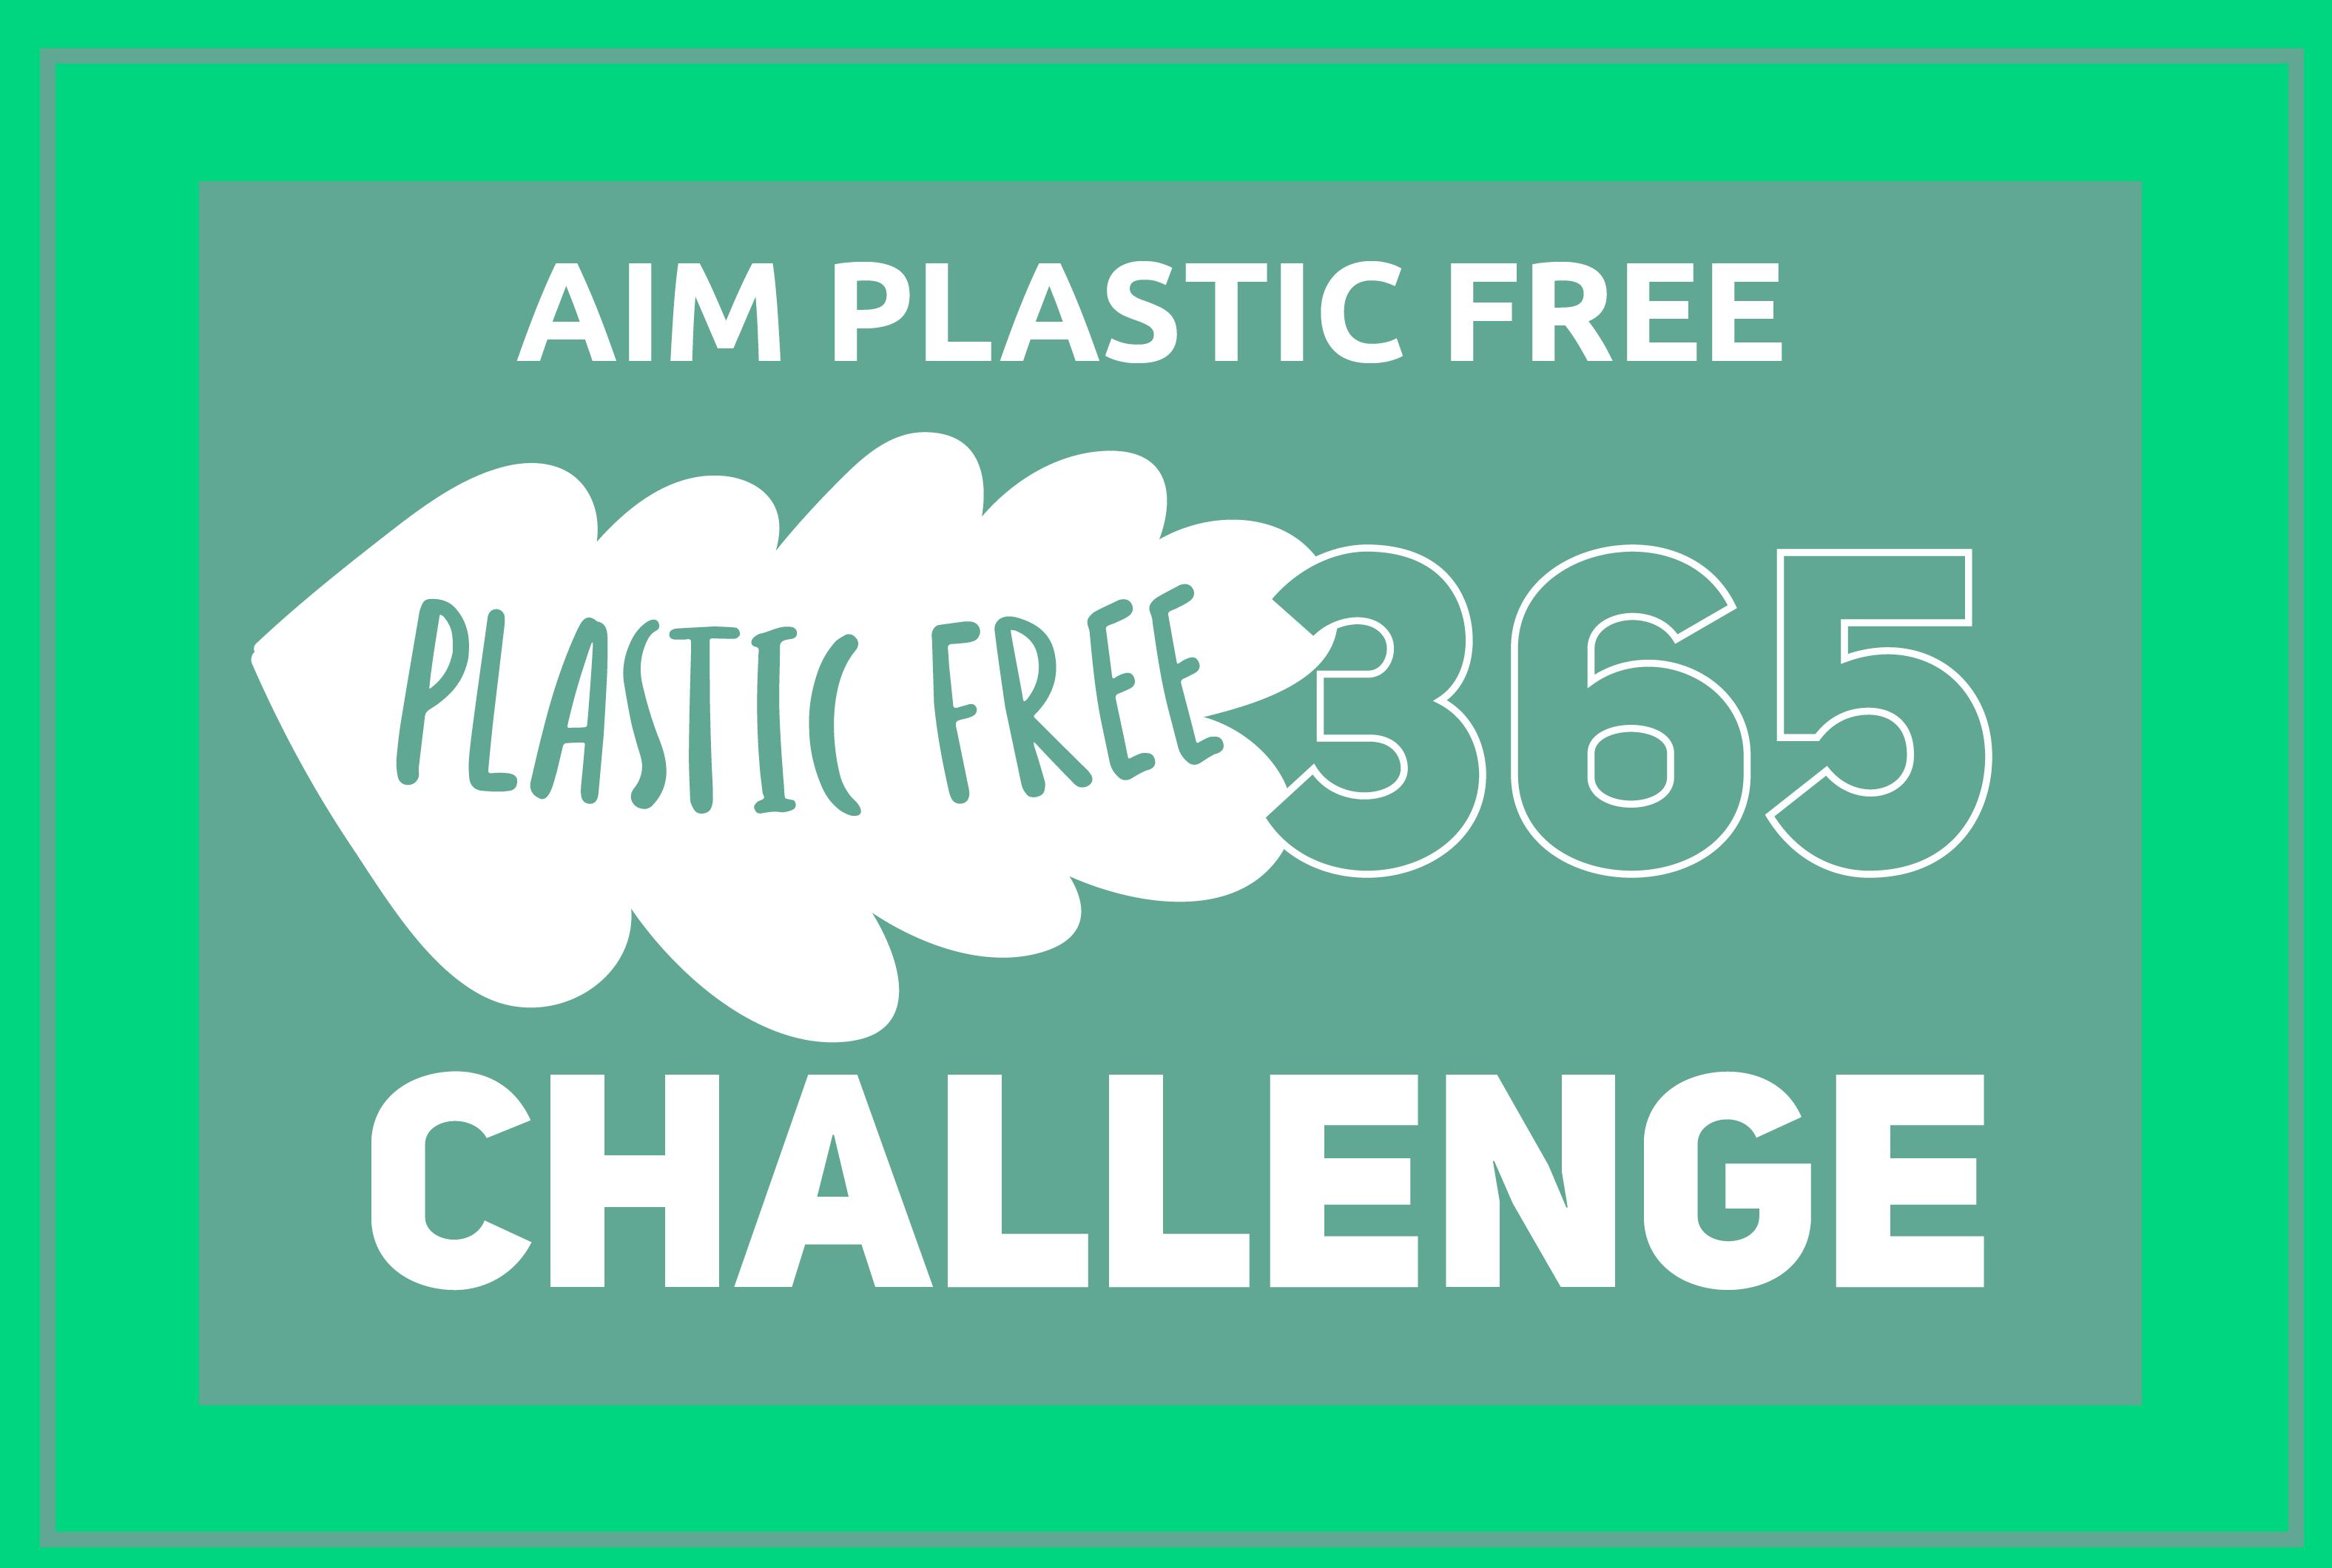 Aim Plastic Free Challange!